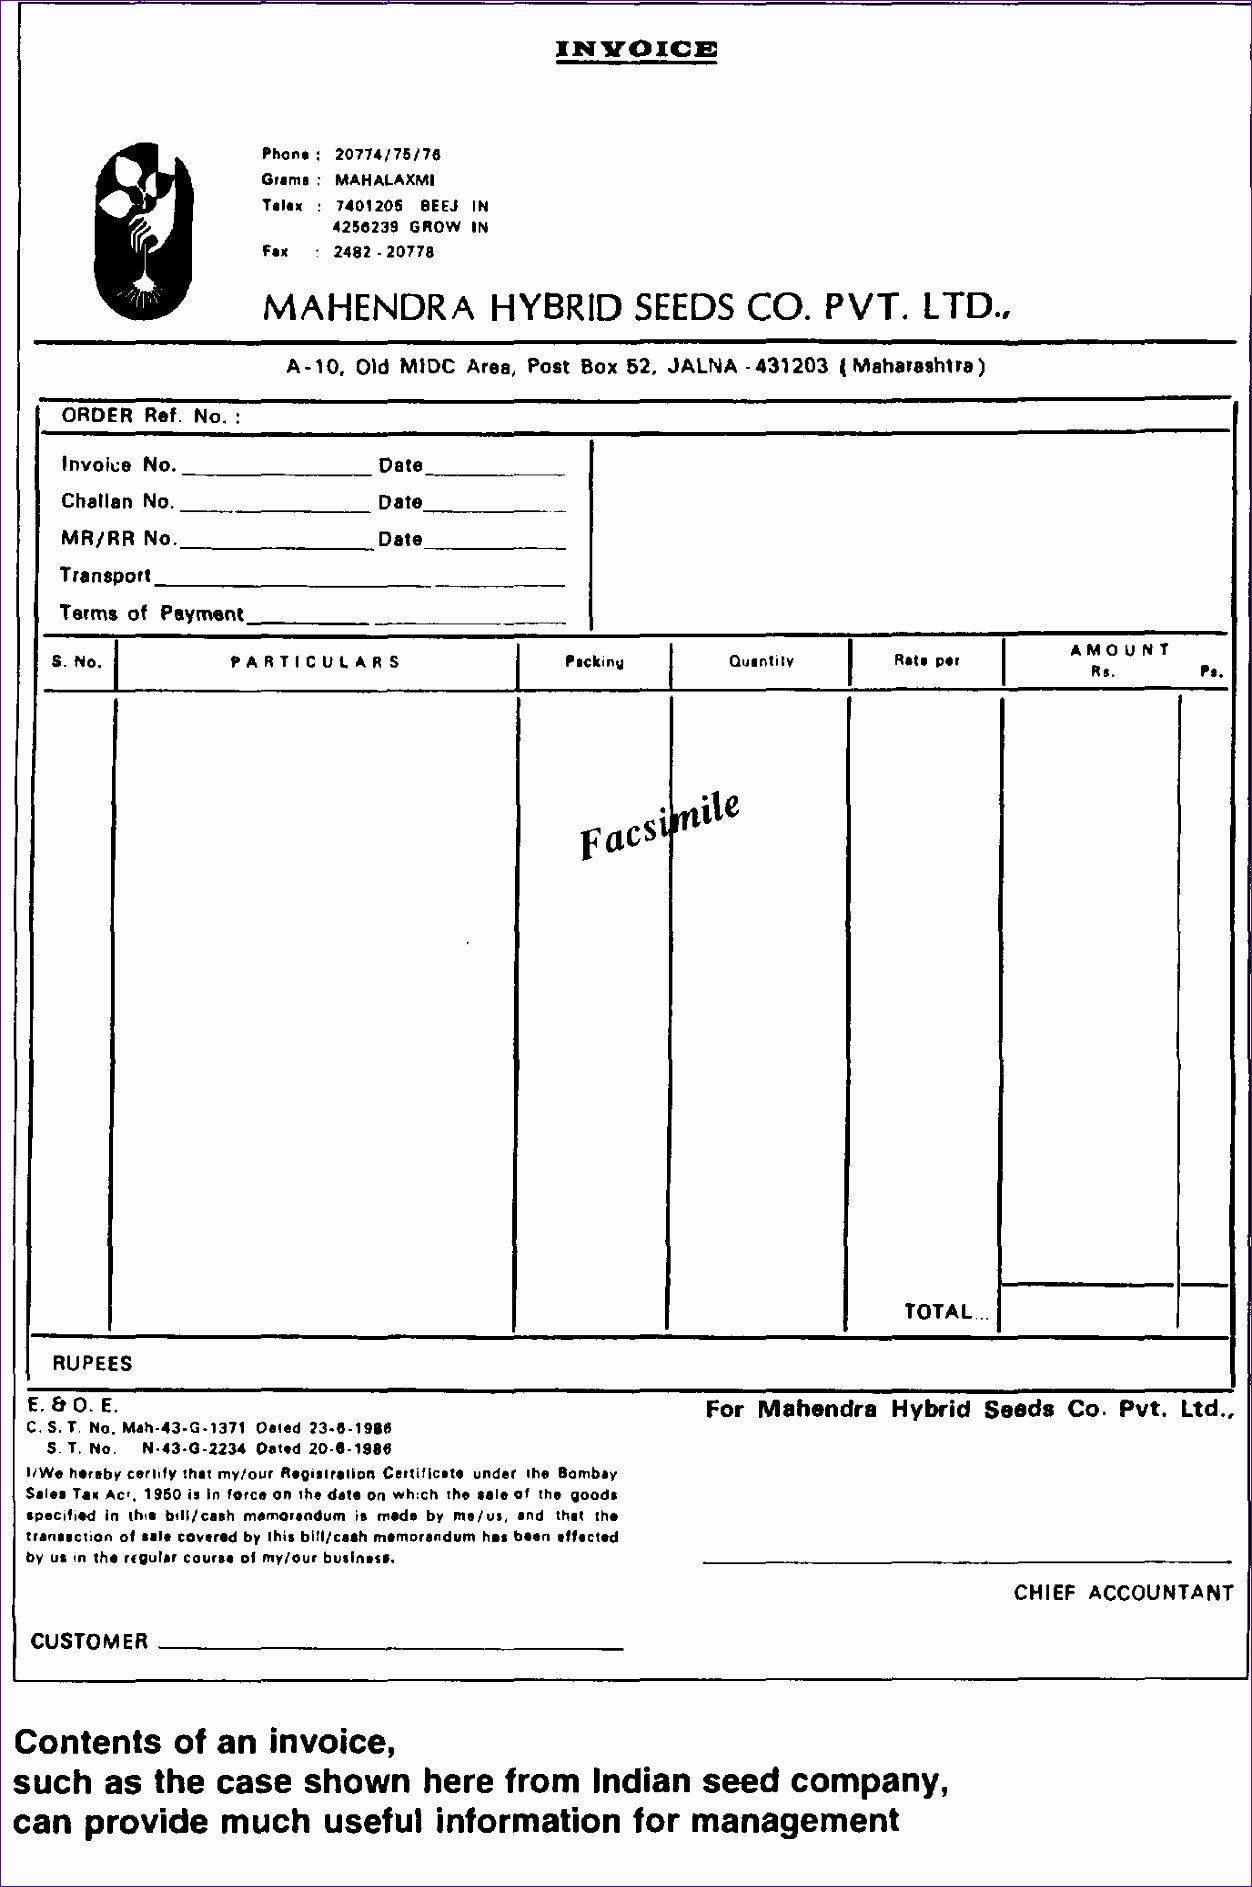 Automotive Repair Invoice Template Excel Inspirational 6 Free Auto Repair Invoice Template Excel Exceltemplates